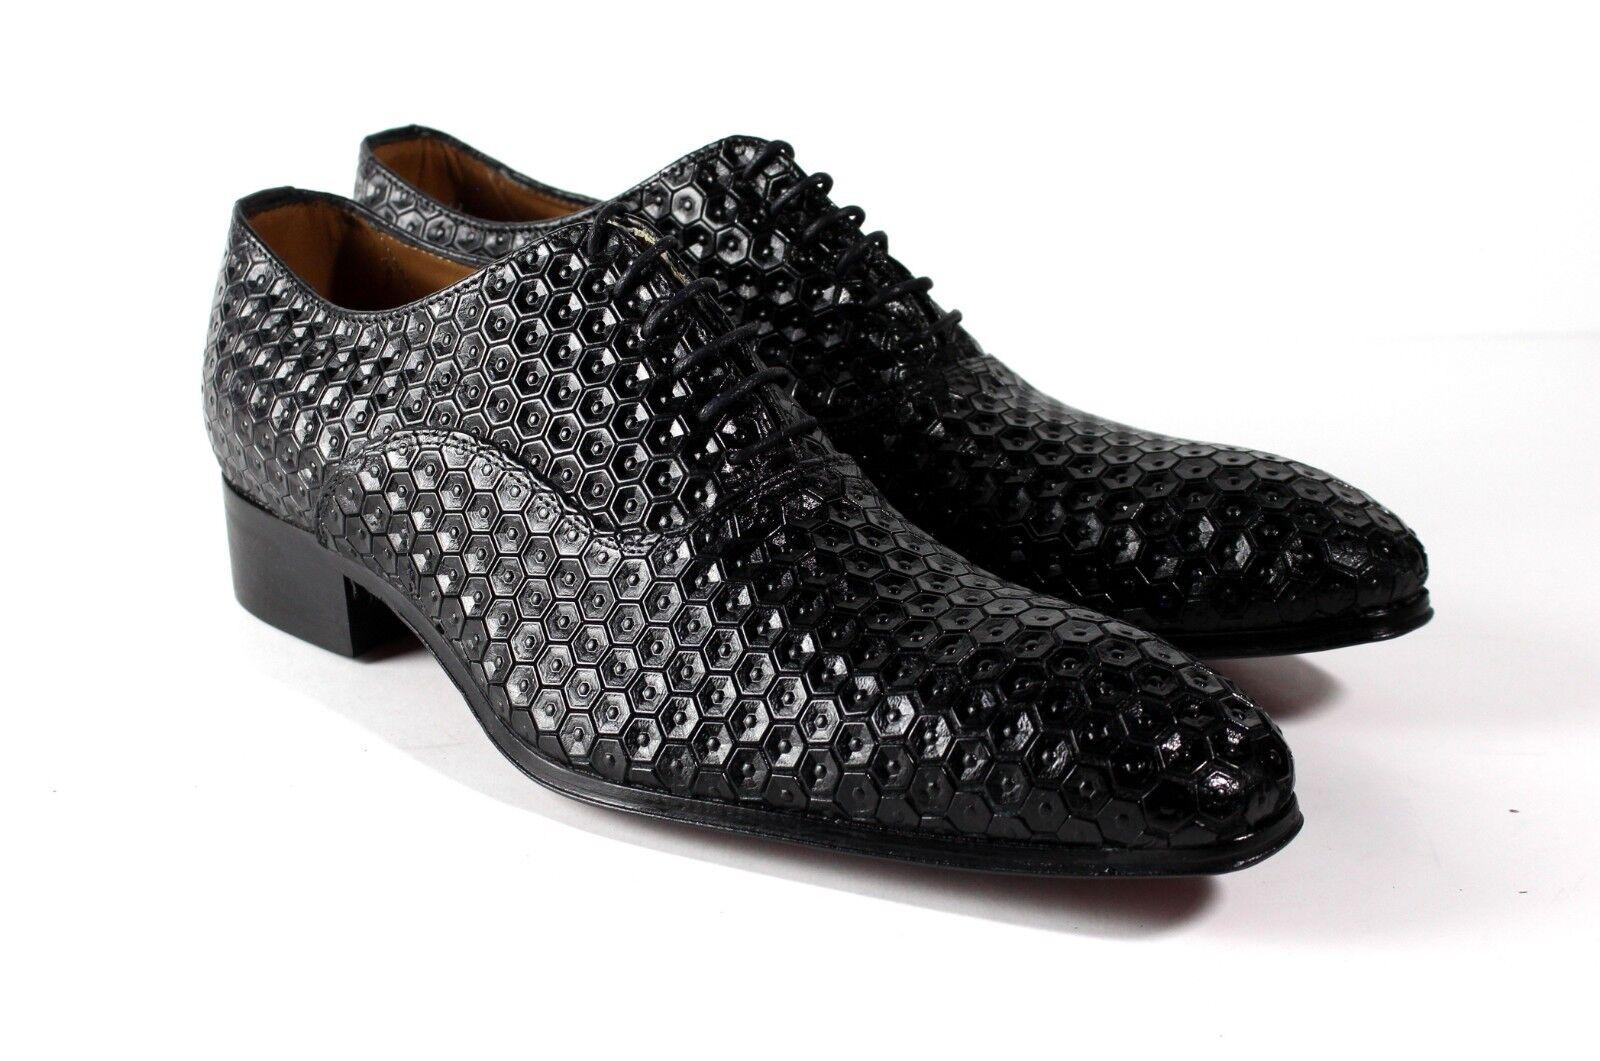 Ivan Troy Schwarz Bayern Handgefertigt Italienisches Leder Formelle Schuhe Schuhe Schuhe   1d4e3c